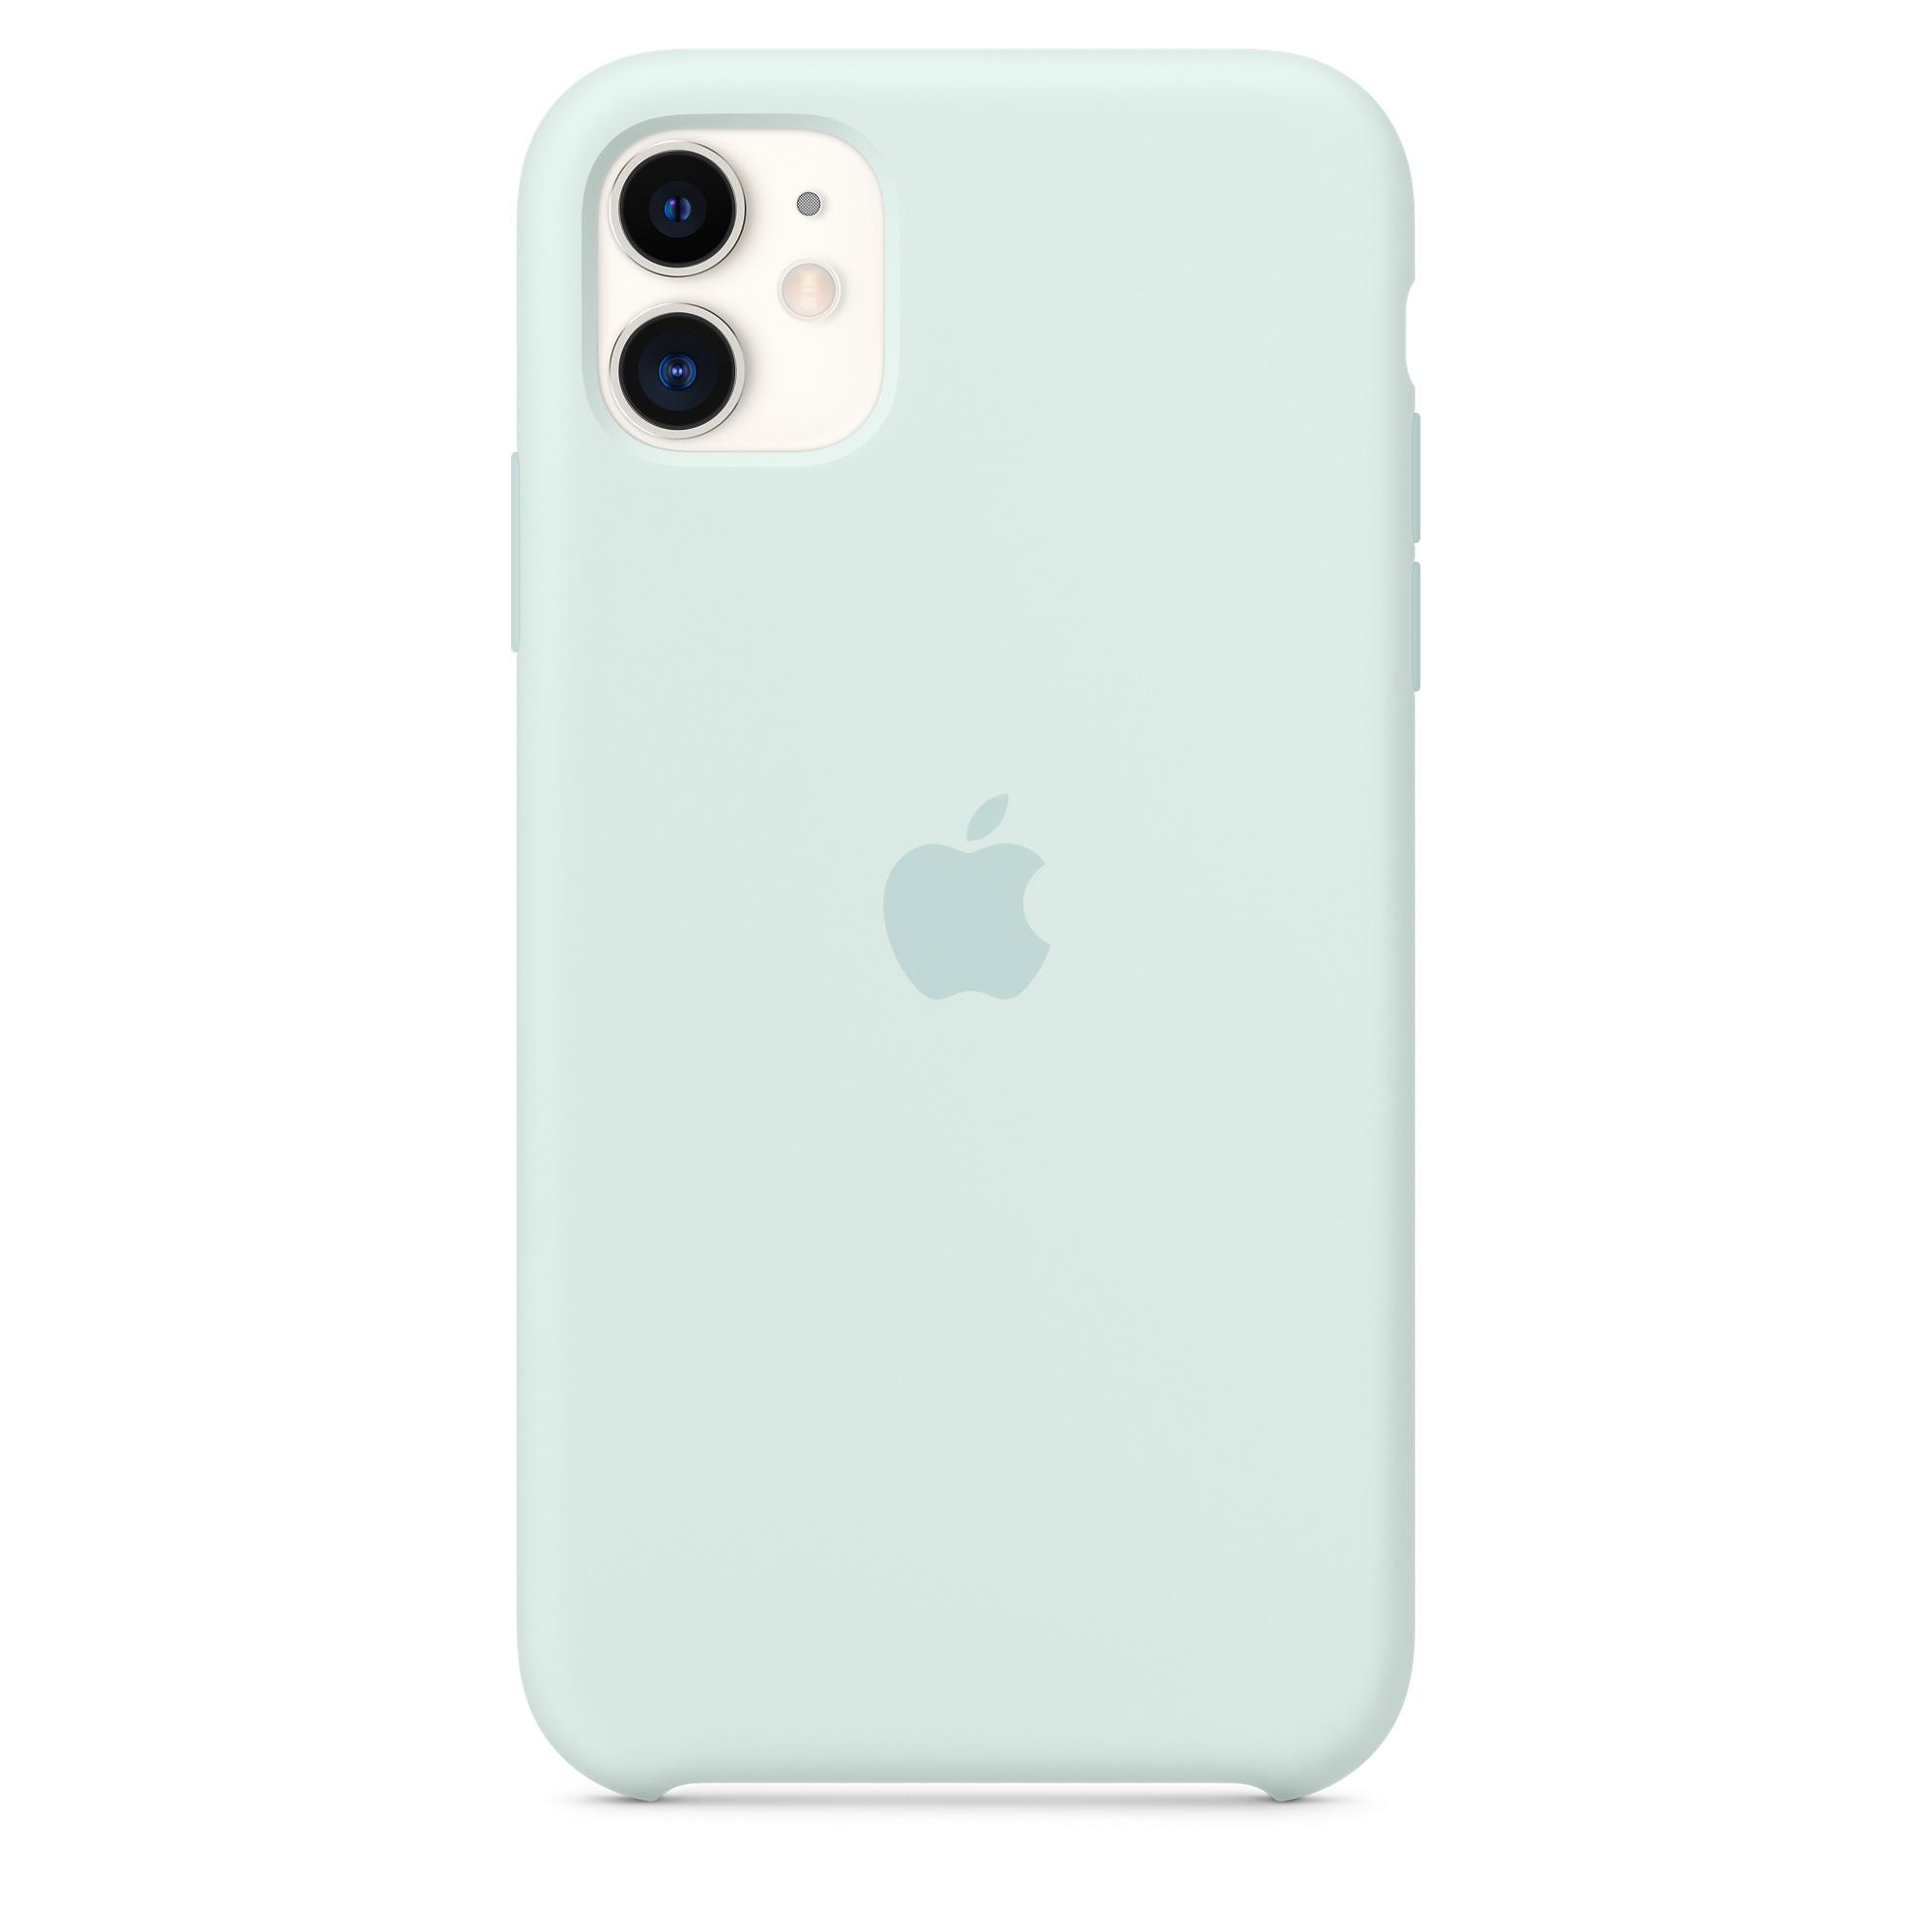 Custodia in silicone per iPhone 11 - Schiuma marina